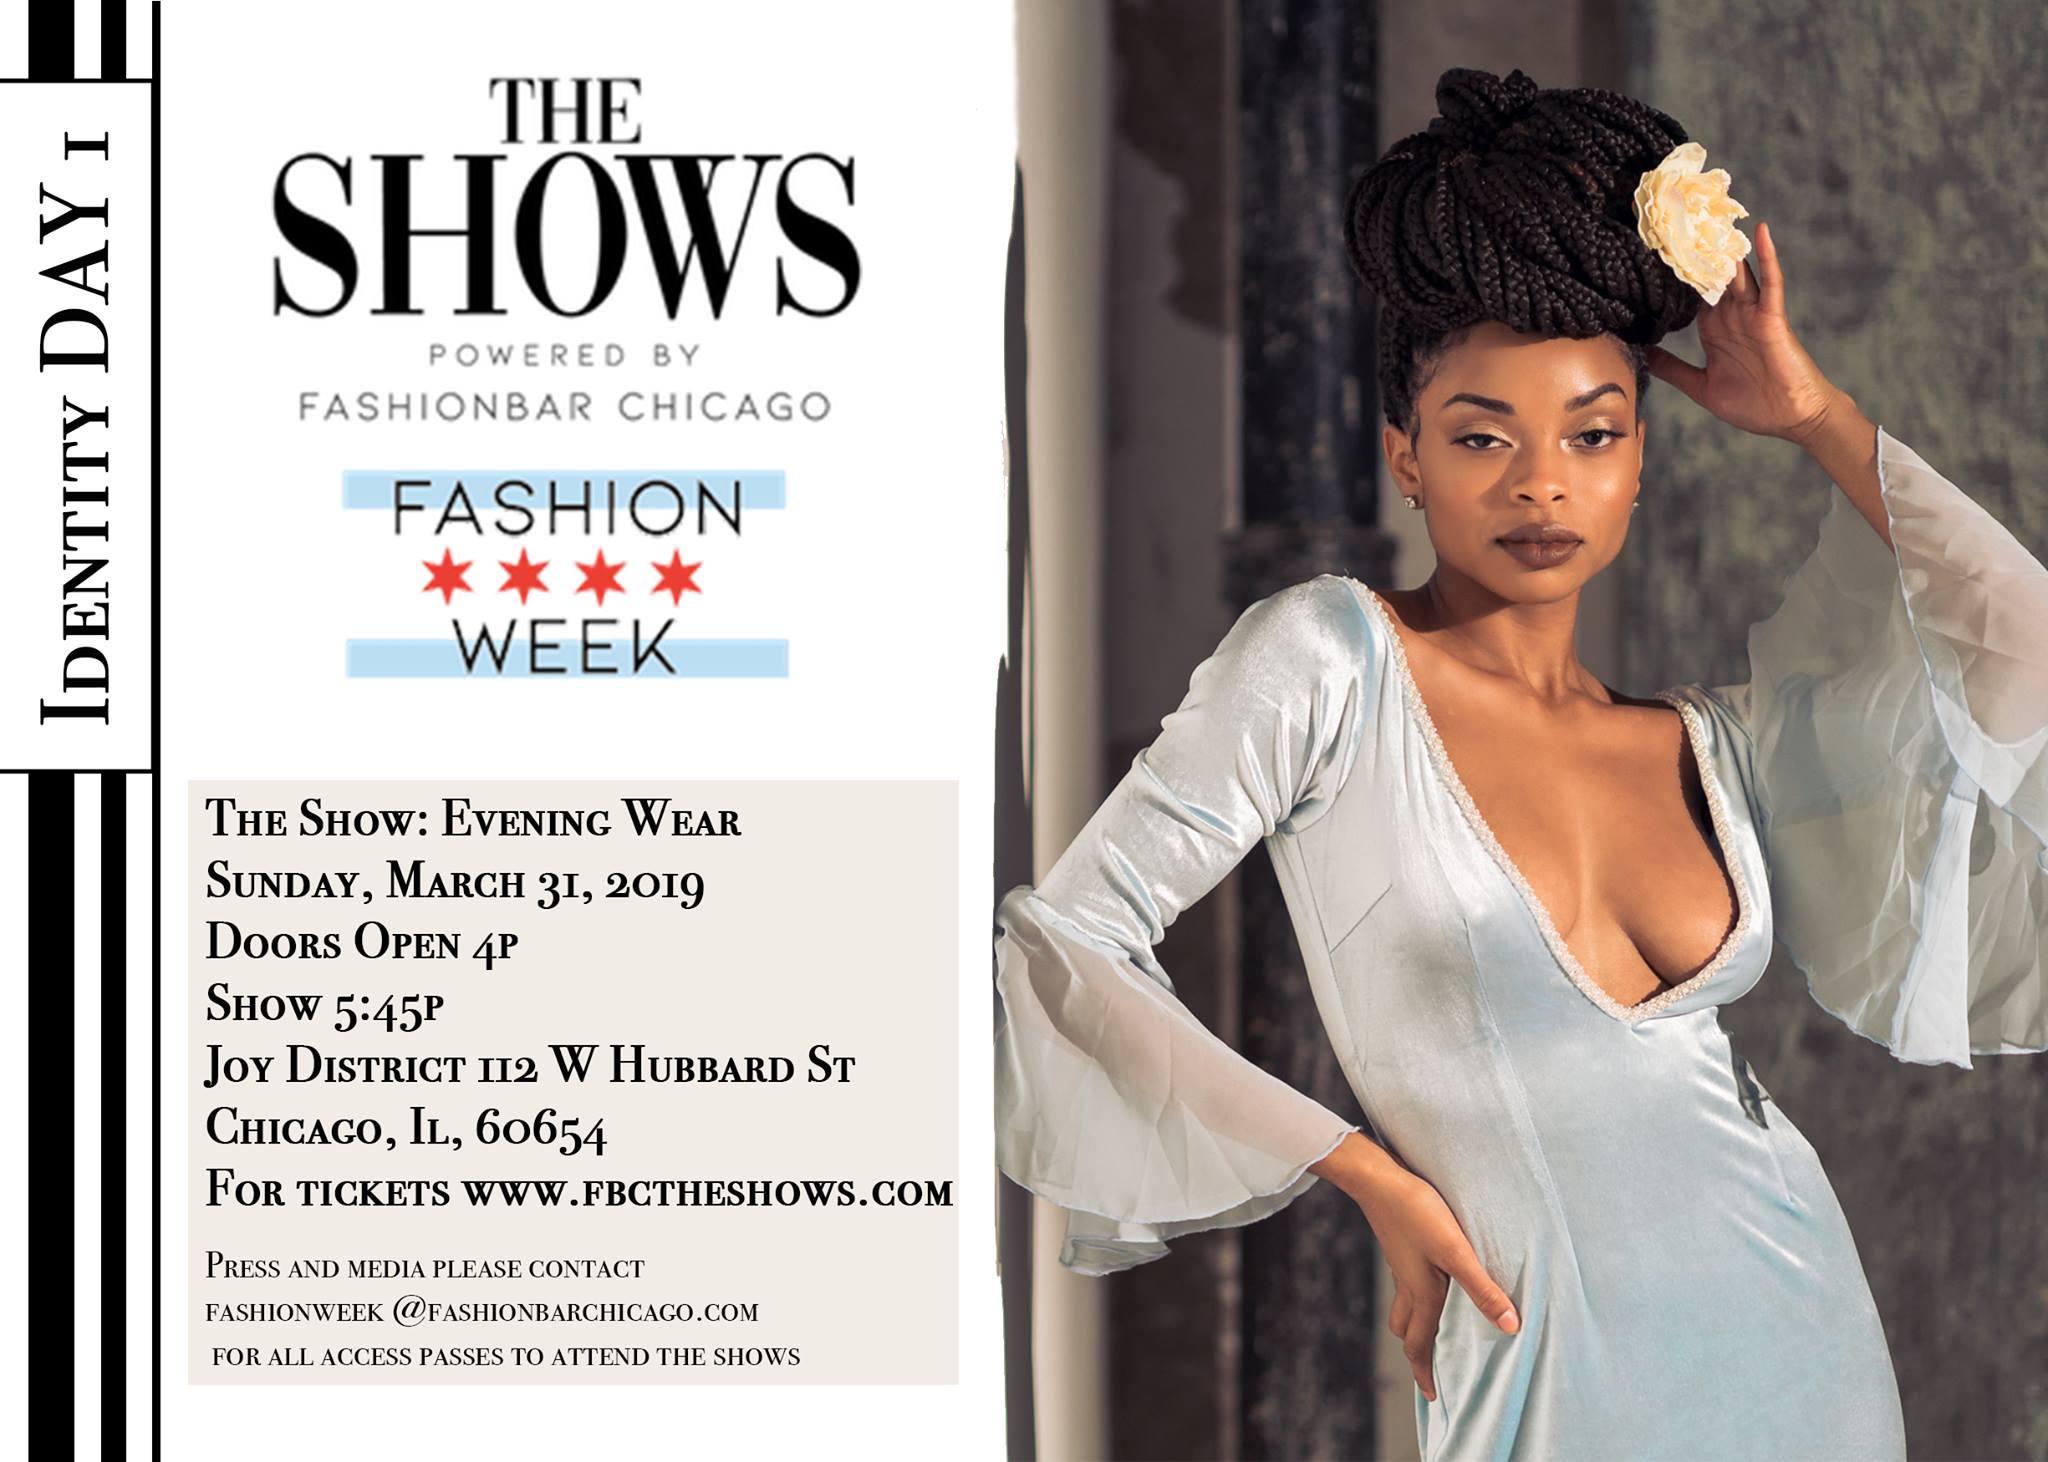 Make Up First at Chicago Fashion Week